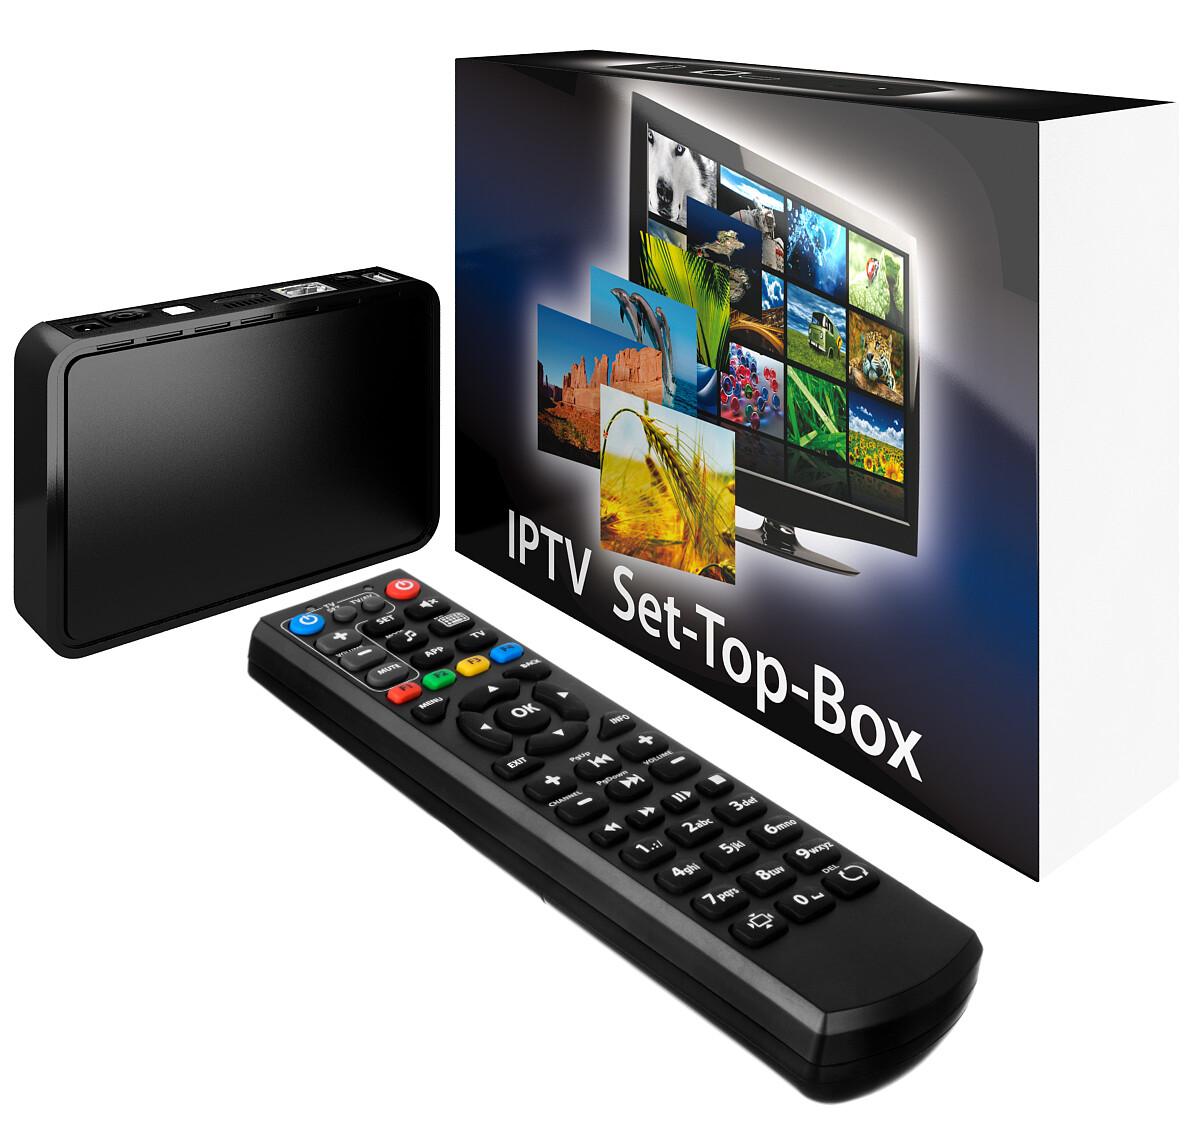 IPTV Set Top Box MAG 250